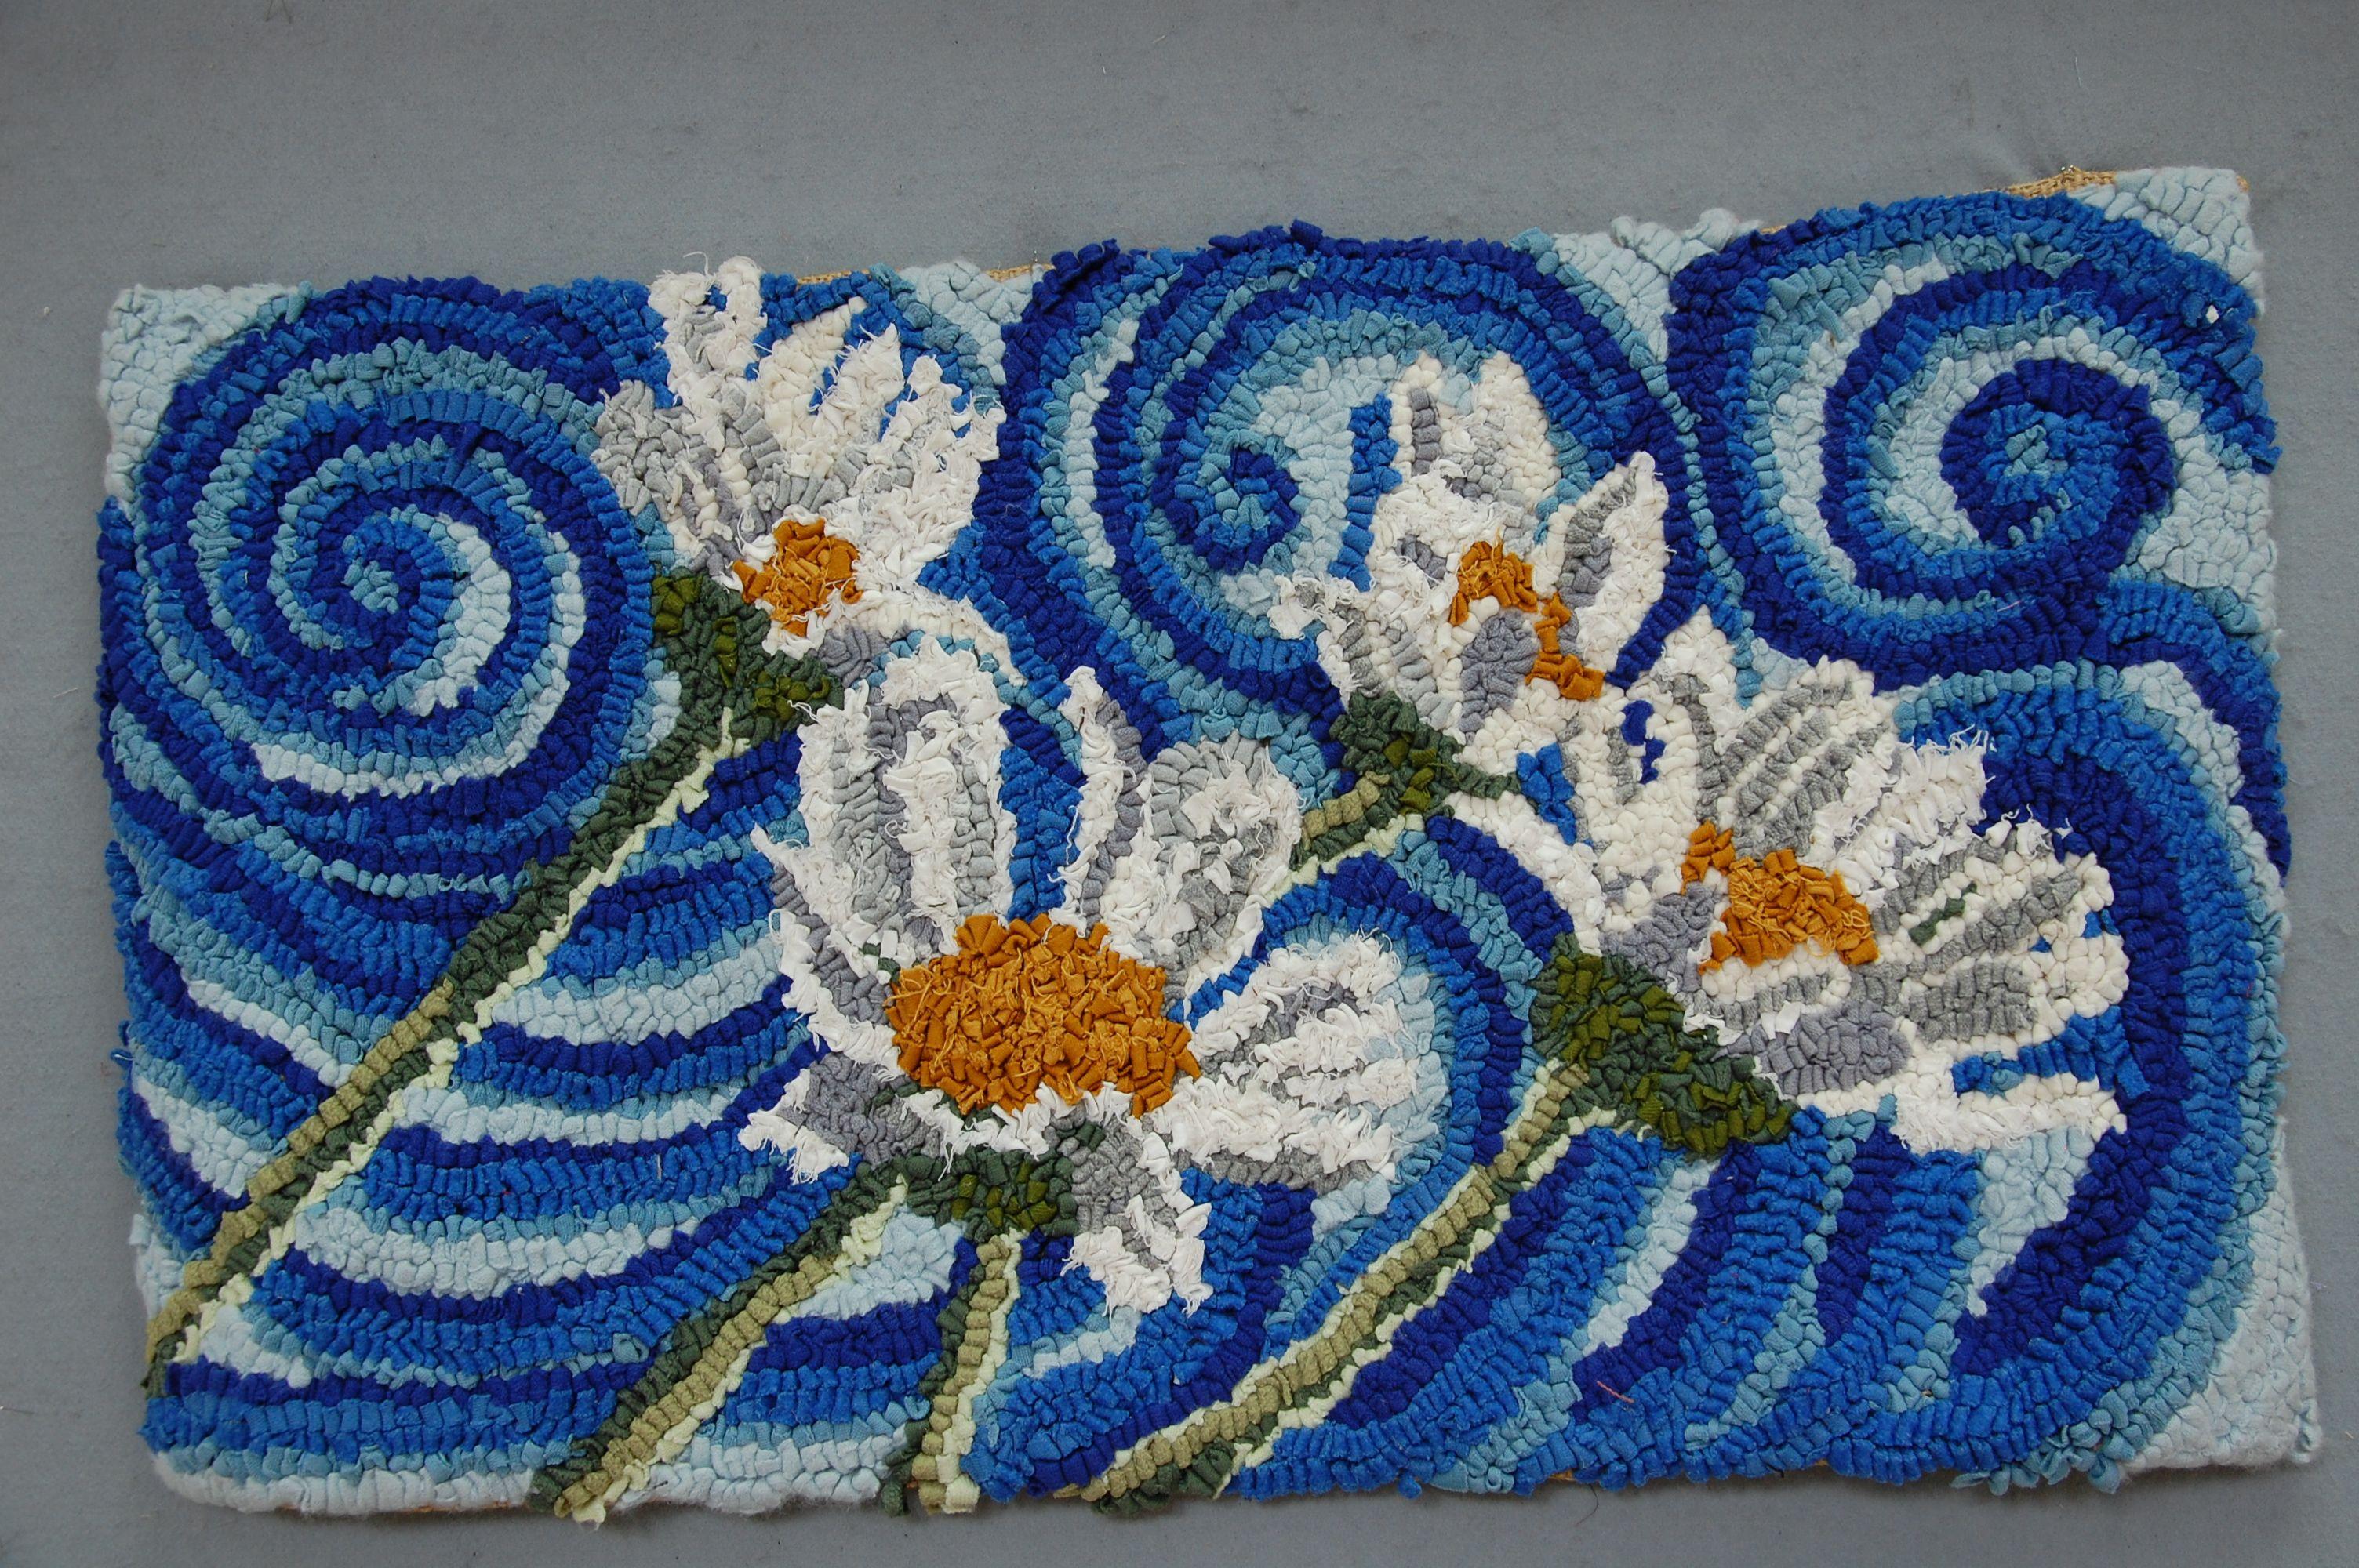 Rag Rug Making In A Vintage Style Short Course With Debbie Siniska Www Westdean Org Uk College